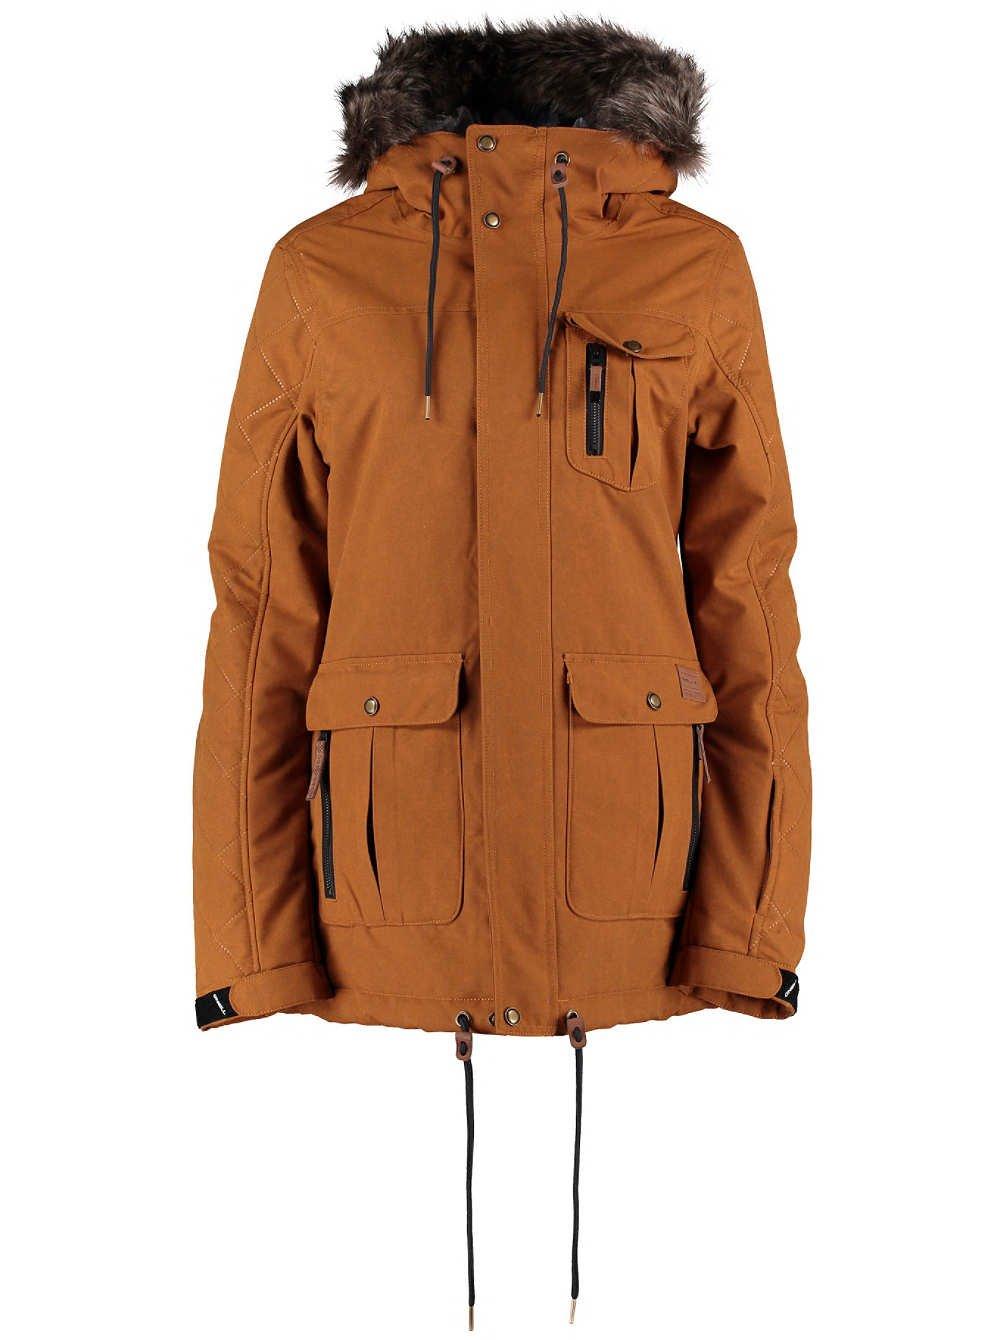 Damen Snowboard Jacke O'Neill Maad Jacket günstig online kaufen